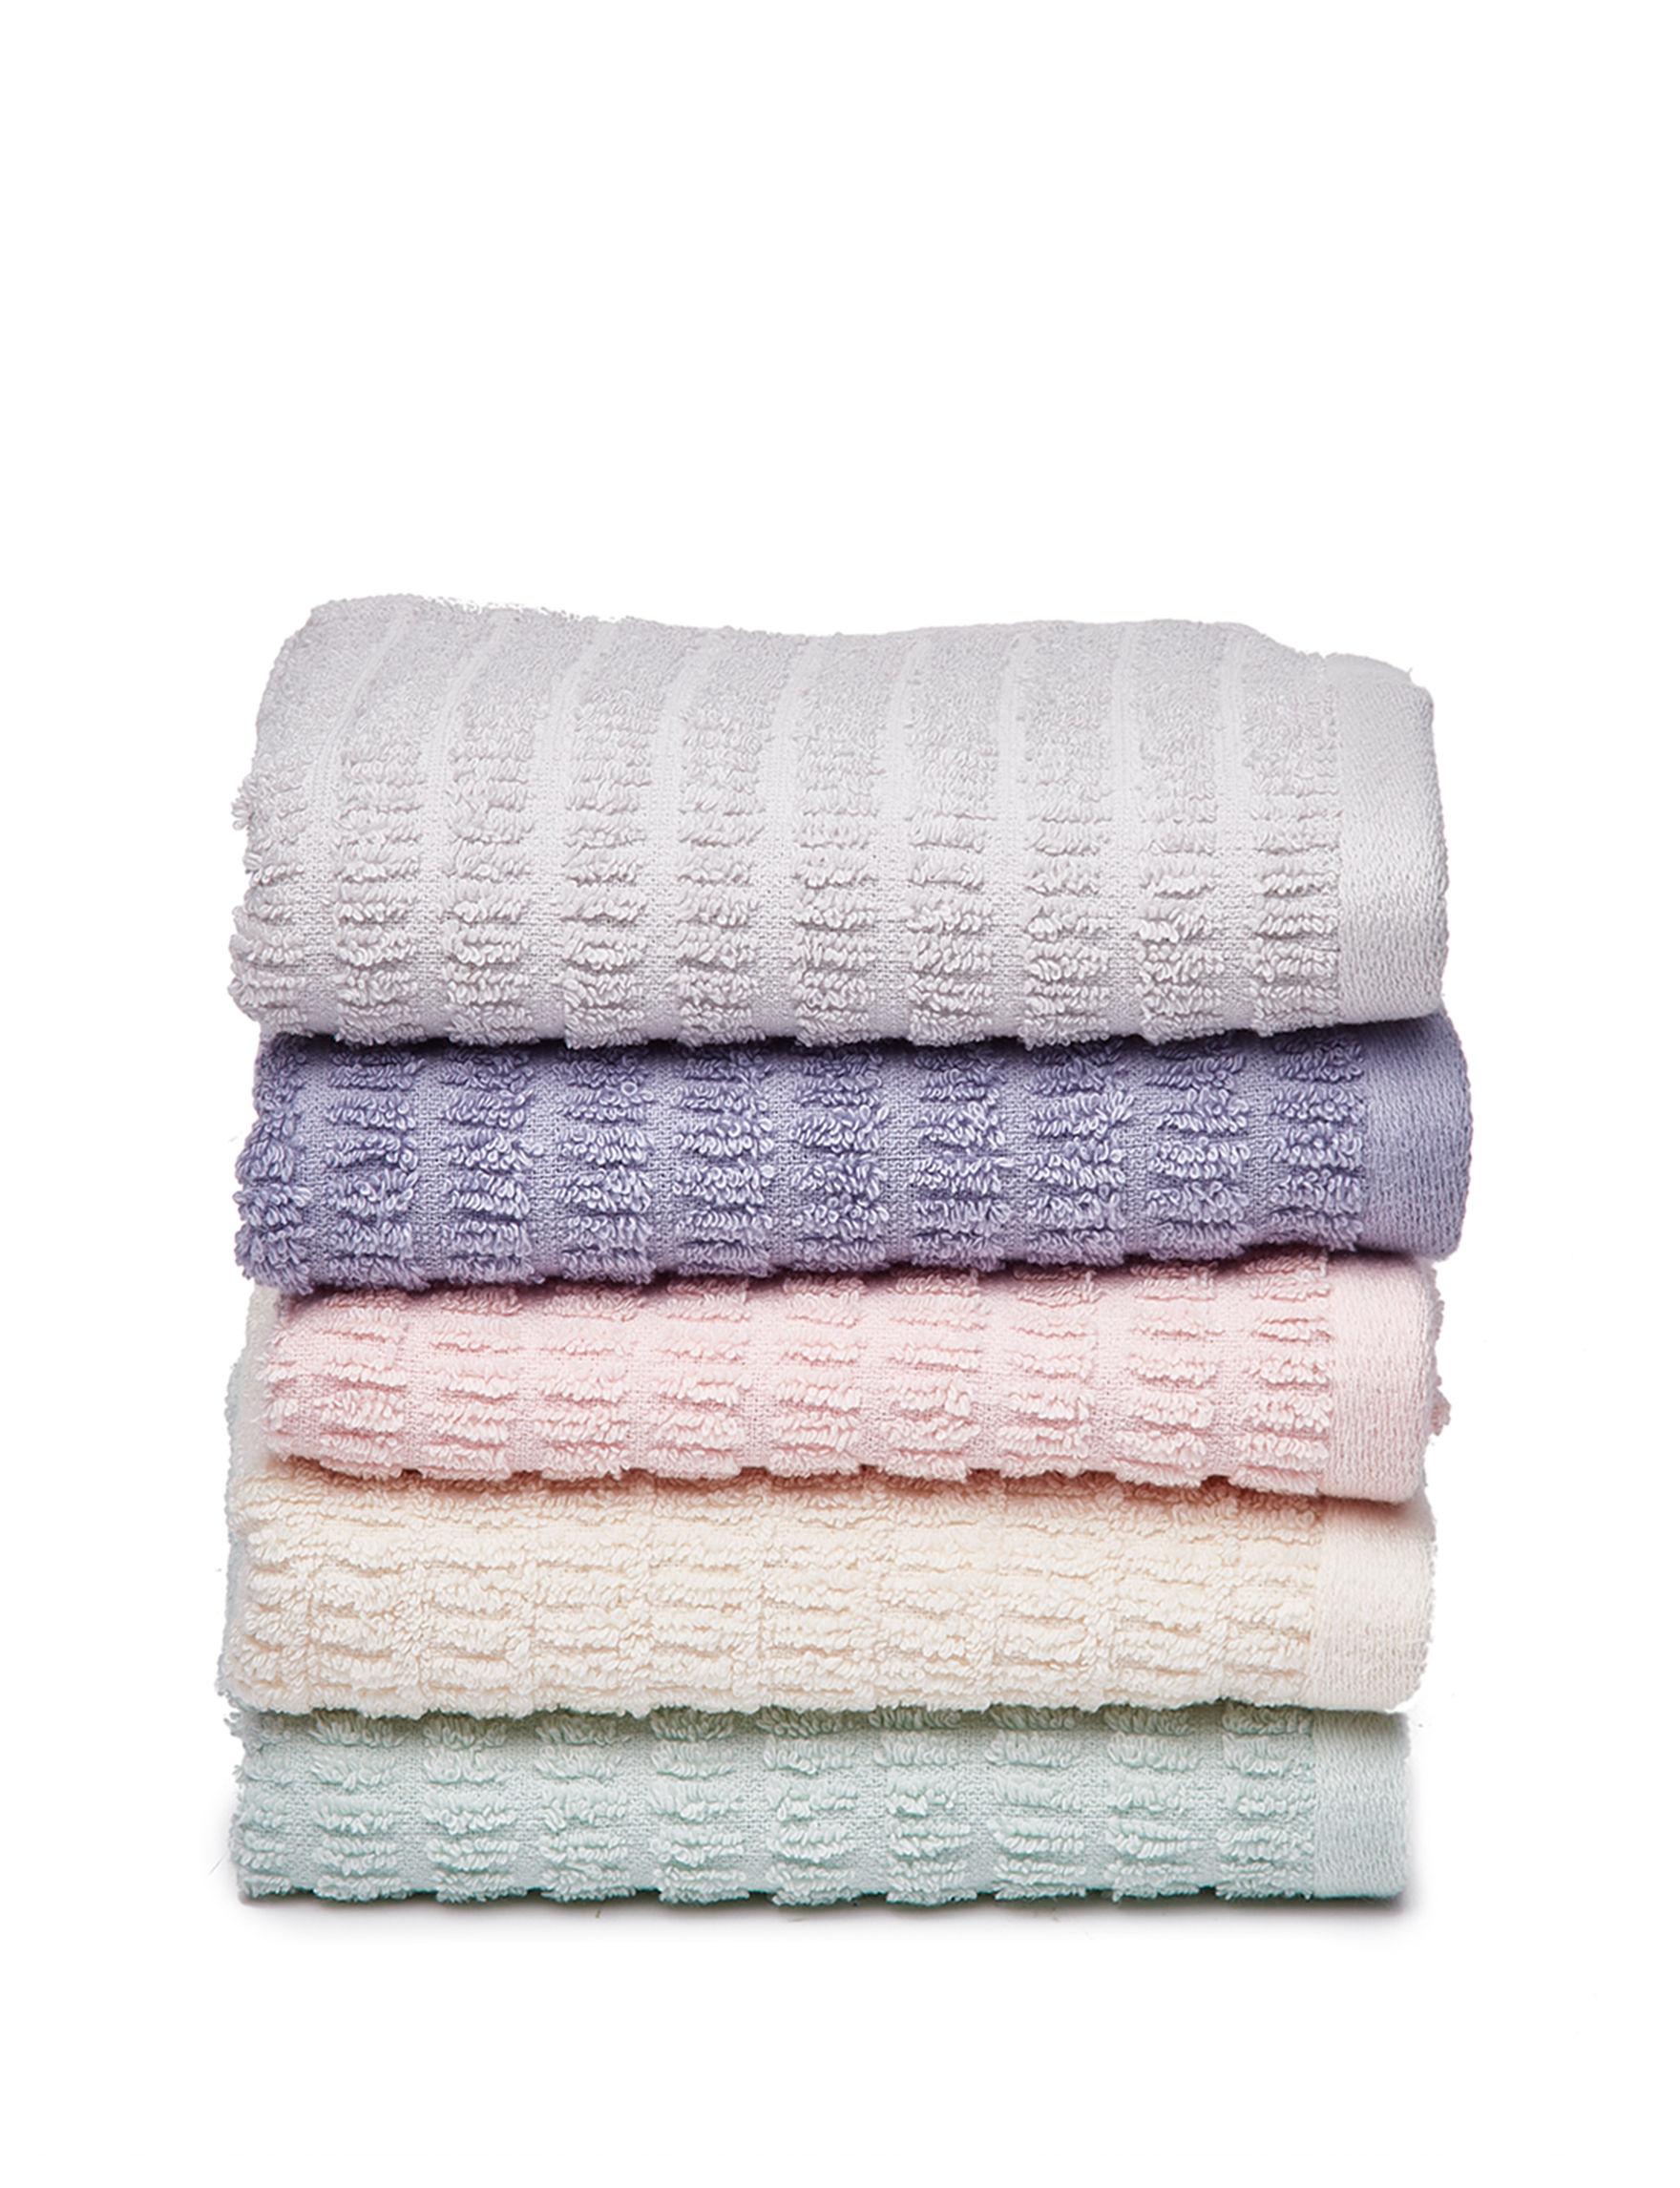 Great Hotels Collection Sea Foam Bath Towels Hand Towels Towels